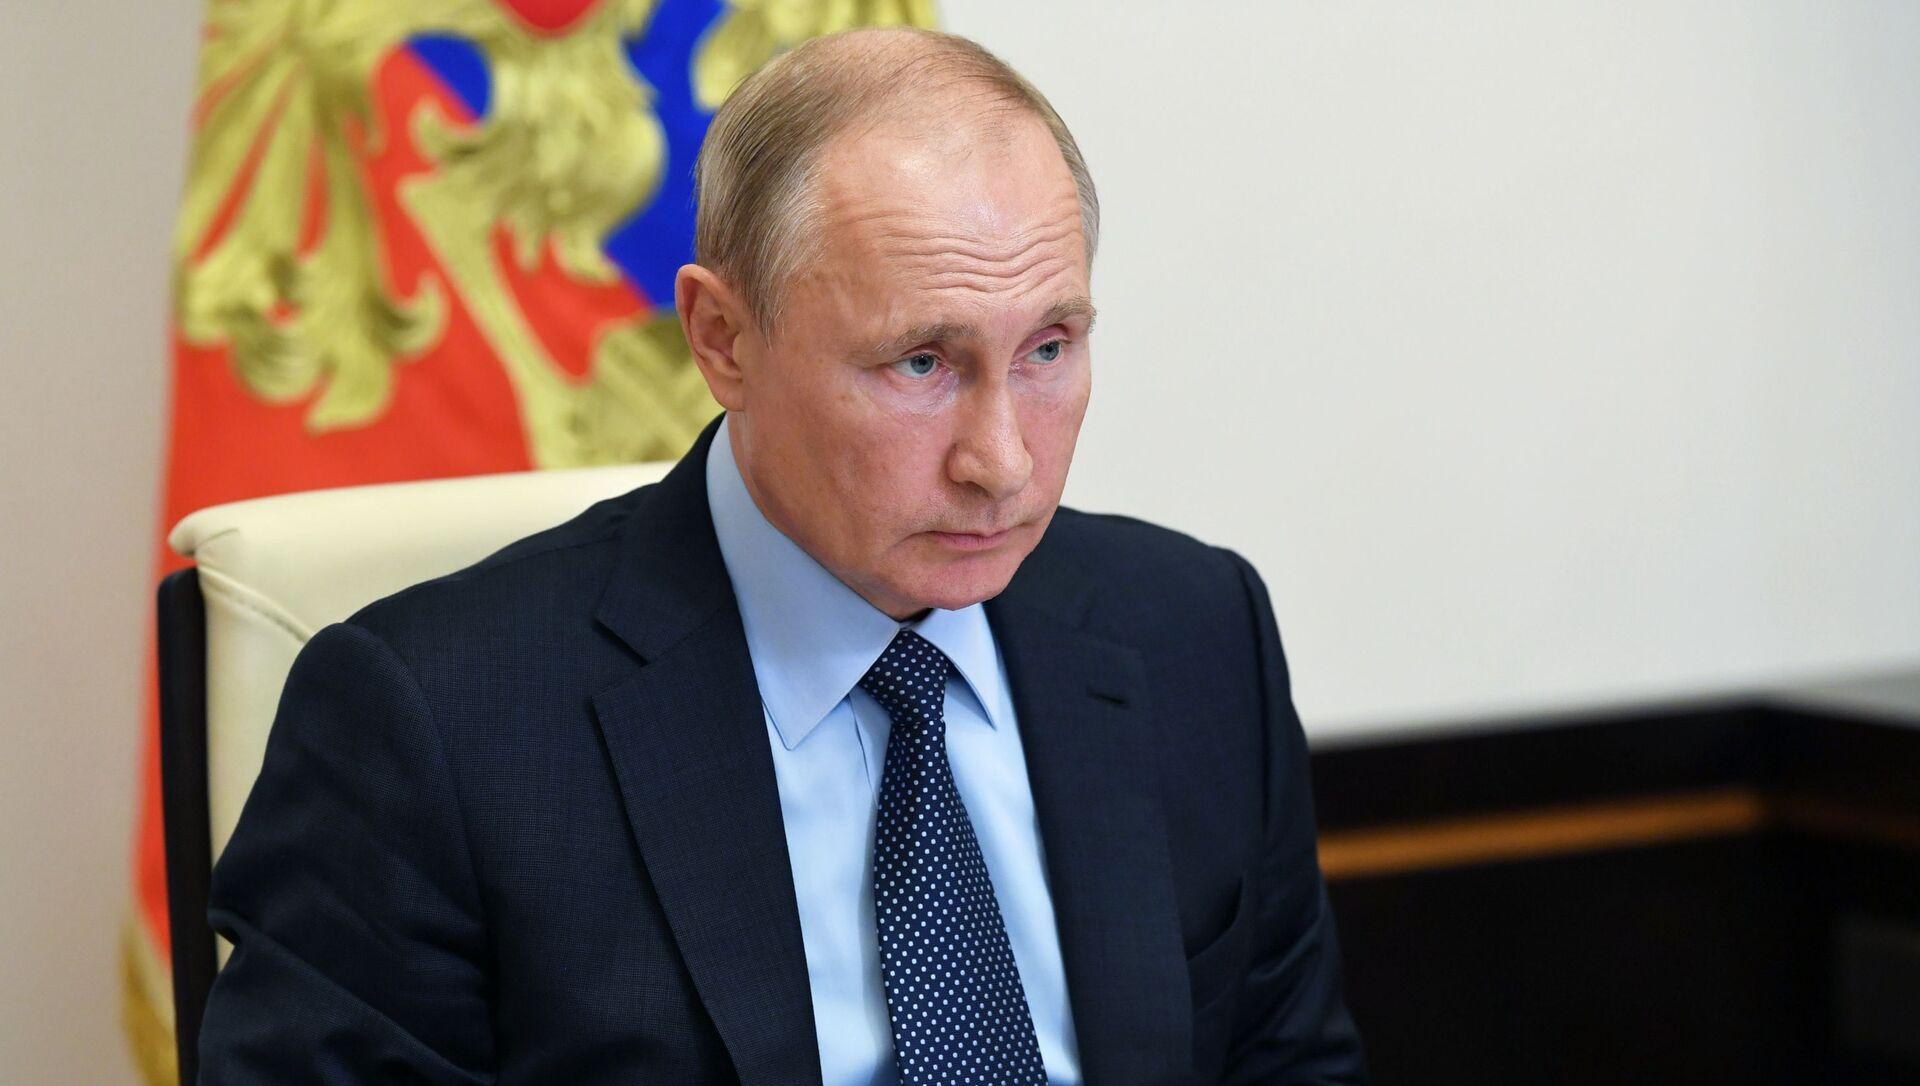 Vladímir Putin, presidente de Rusia - Sputnik Mundo, 1920, 24.07.2020